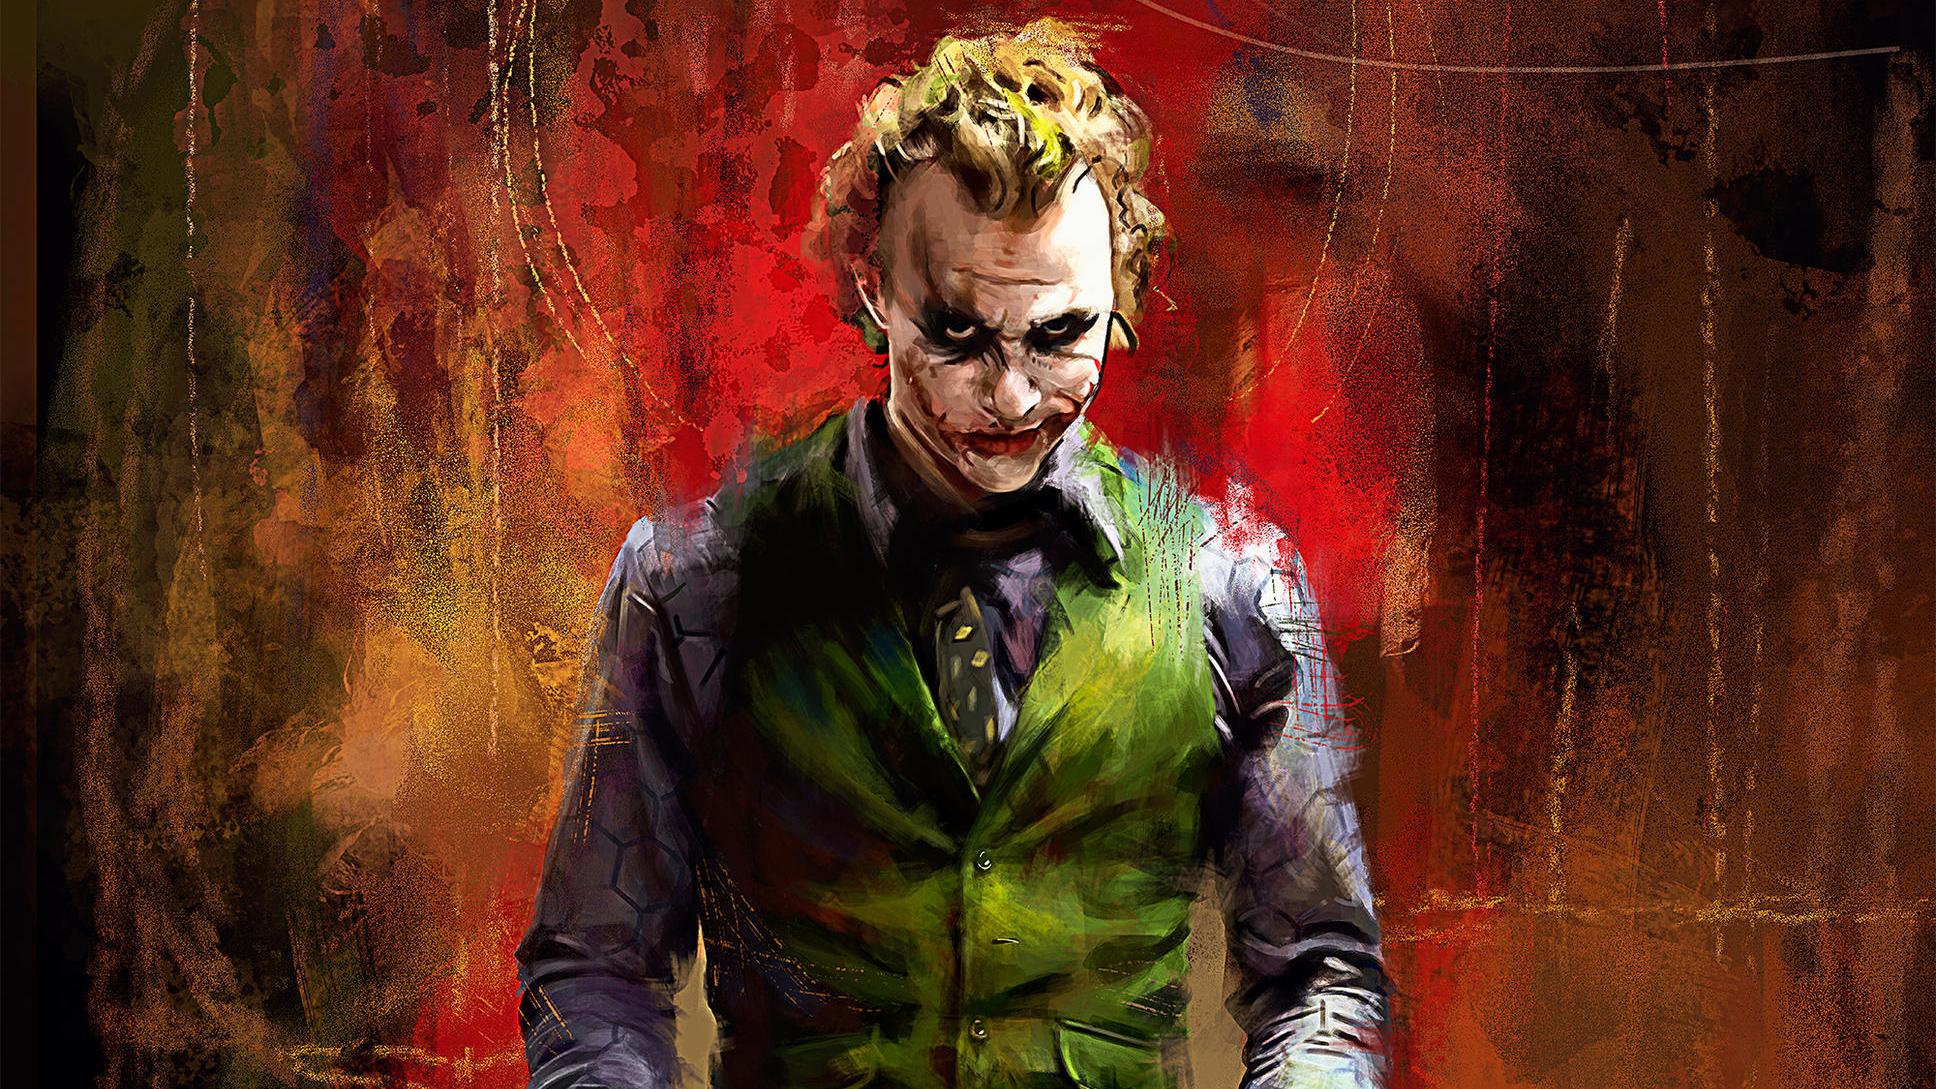 Joker Arts New, HD Superheroes, 4k Wallpapers, Images ...